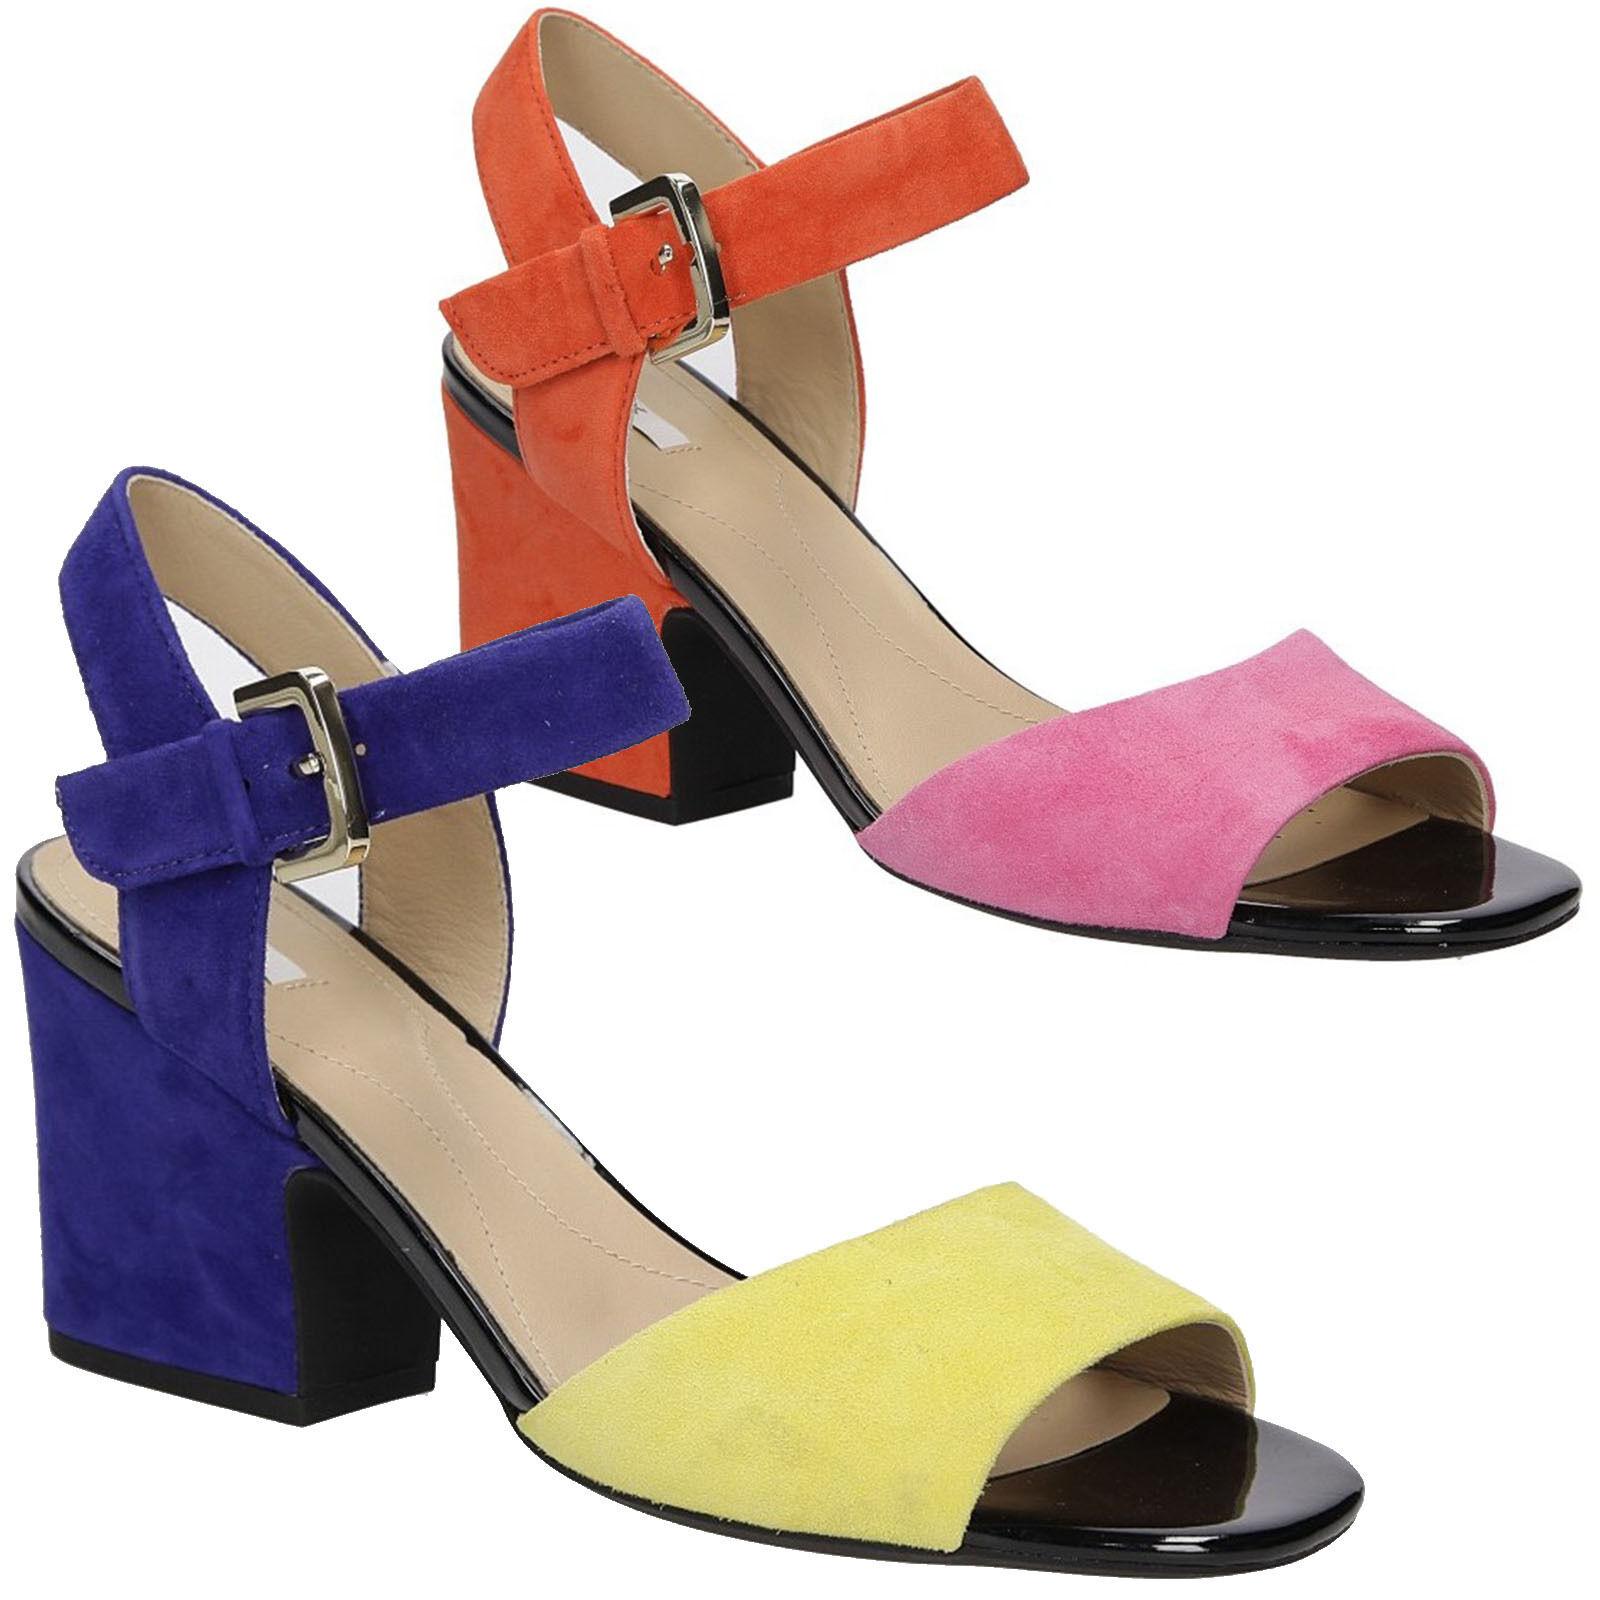 Damen Sandalen GEOX D724UB 00021 Sandaletten Elegant Modisch Gr. 35-39 SALE